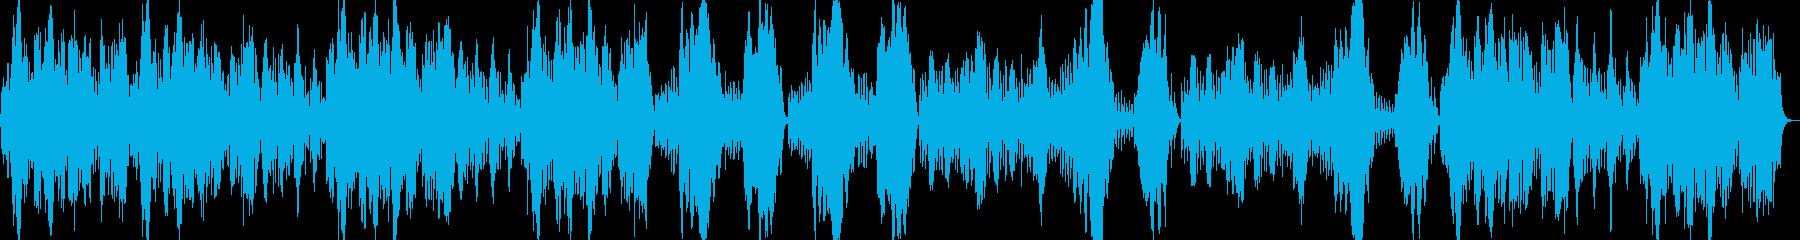 Bockelini's Menut / Bockelini's reproduced waveform